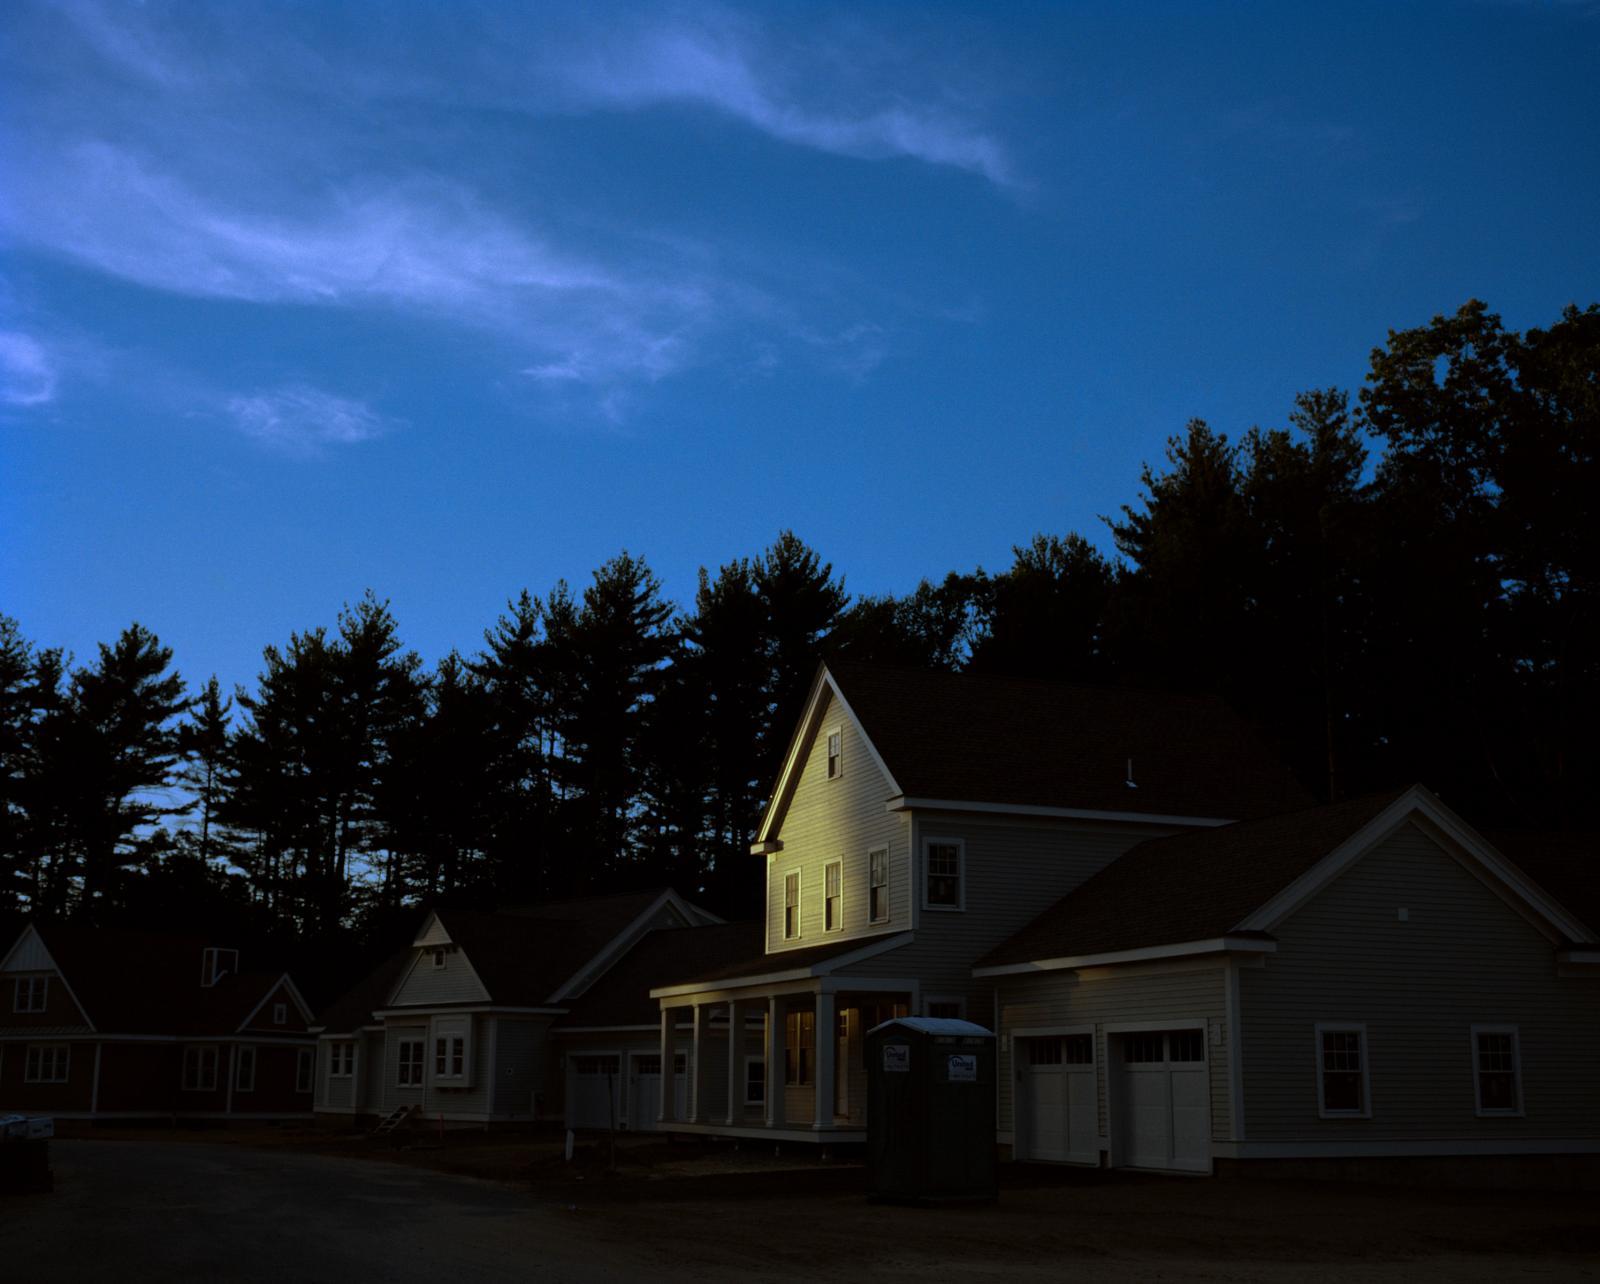 Starmet site, Concord, Massachusetts, USA, 2016